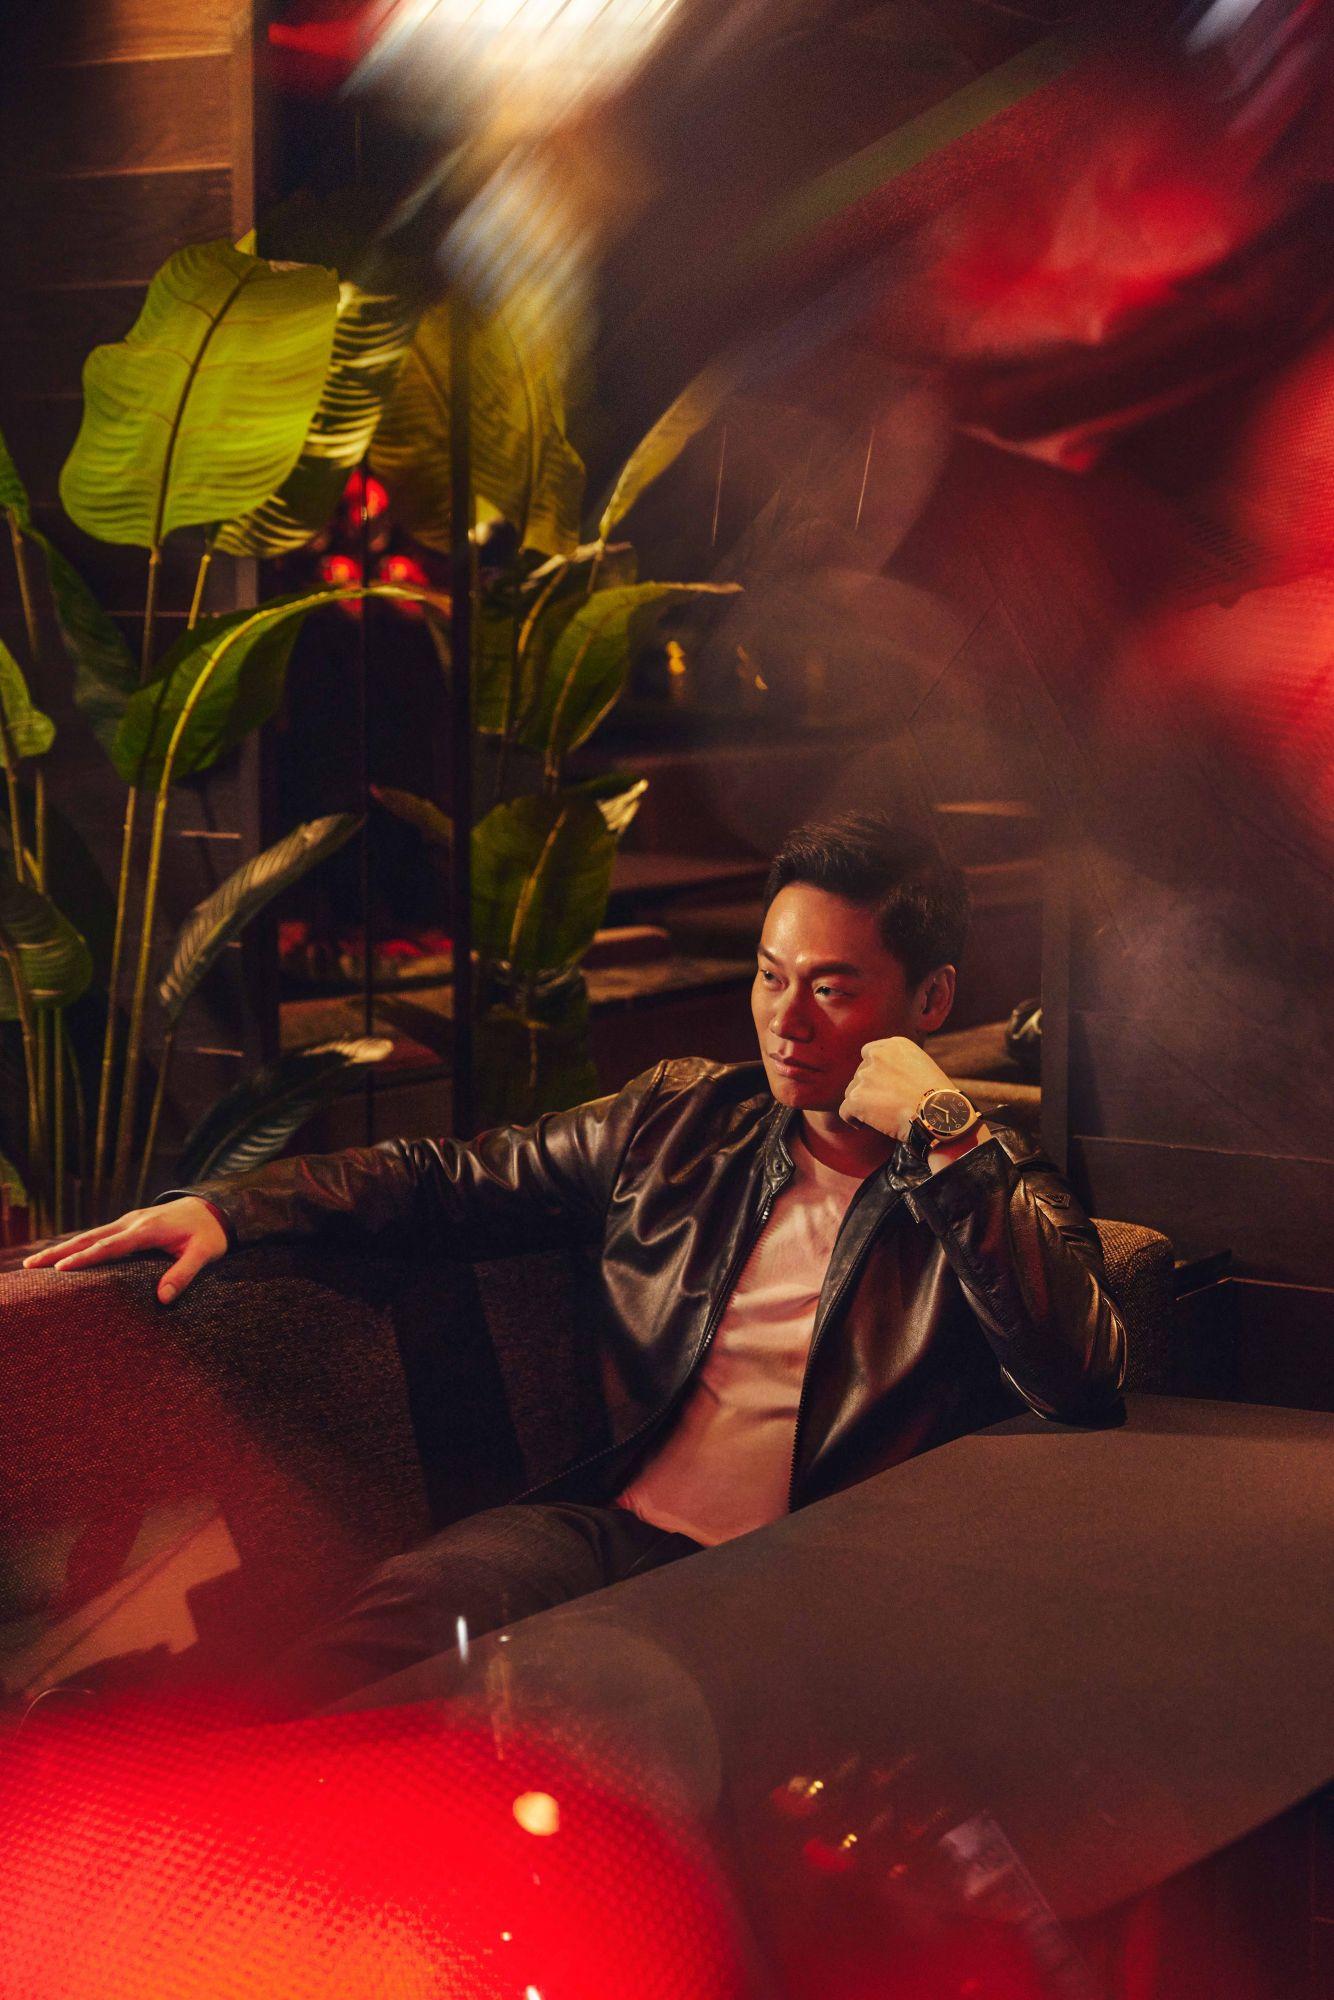 CEO of Zouk Group Andrew Li sports the Luminor Marina Goldtech - 44mm by Panerai